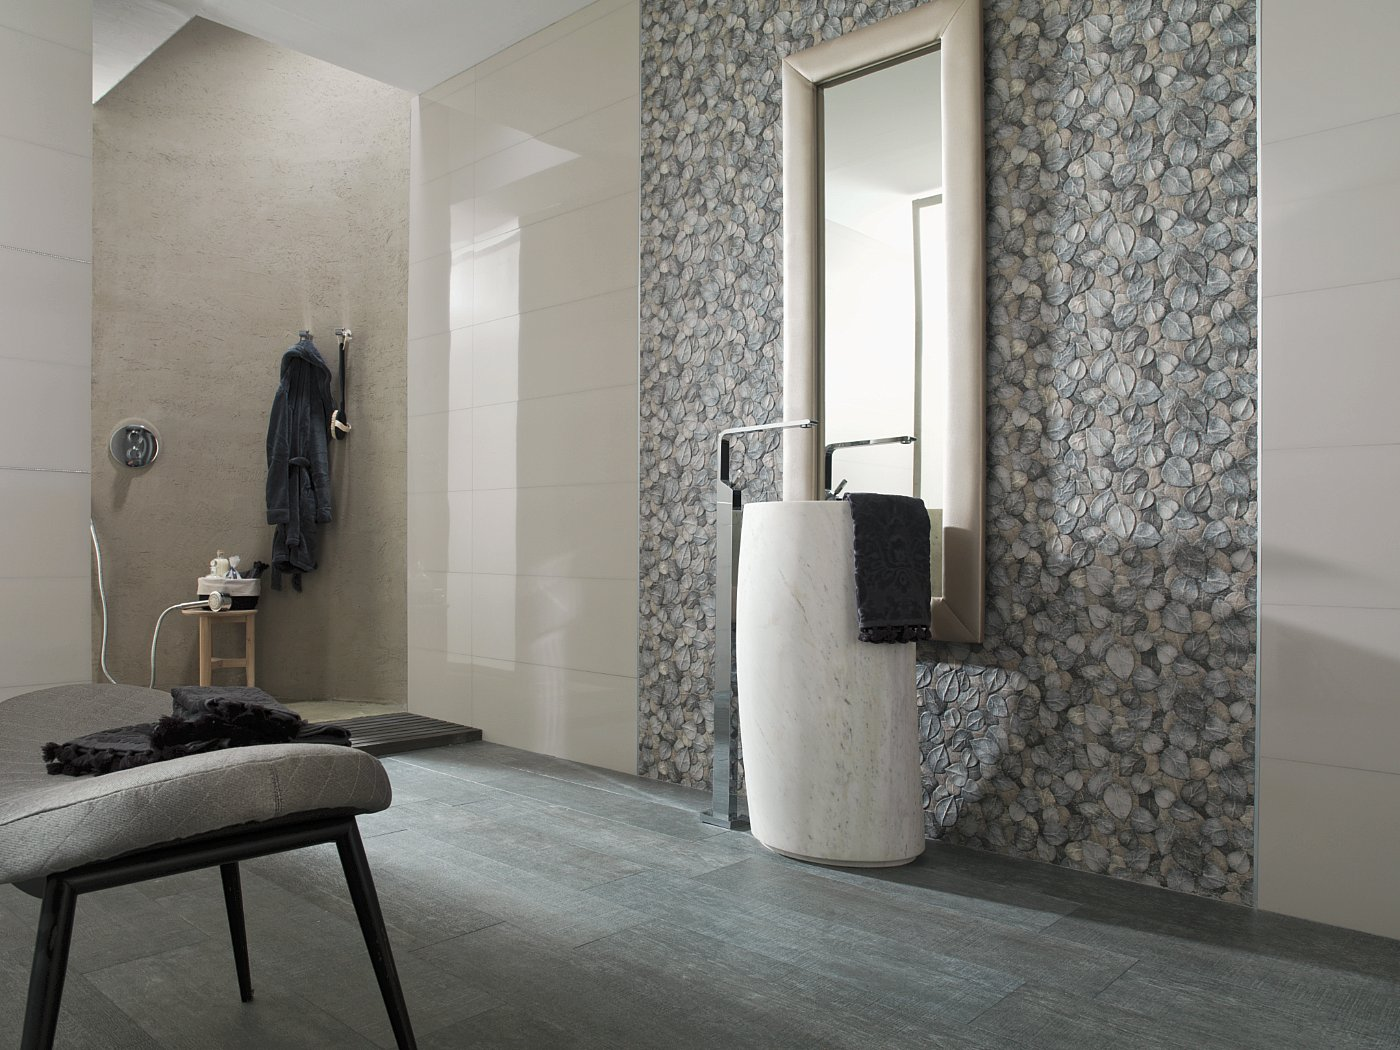 New bathroom designs swerdlow interiors for Porcelanosa bathrooms prices